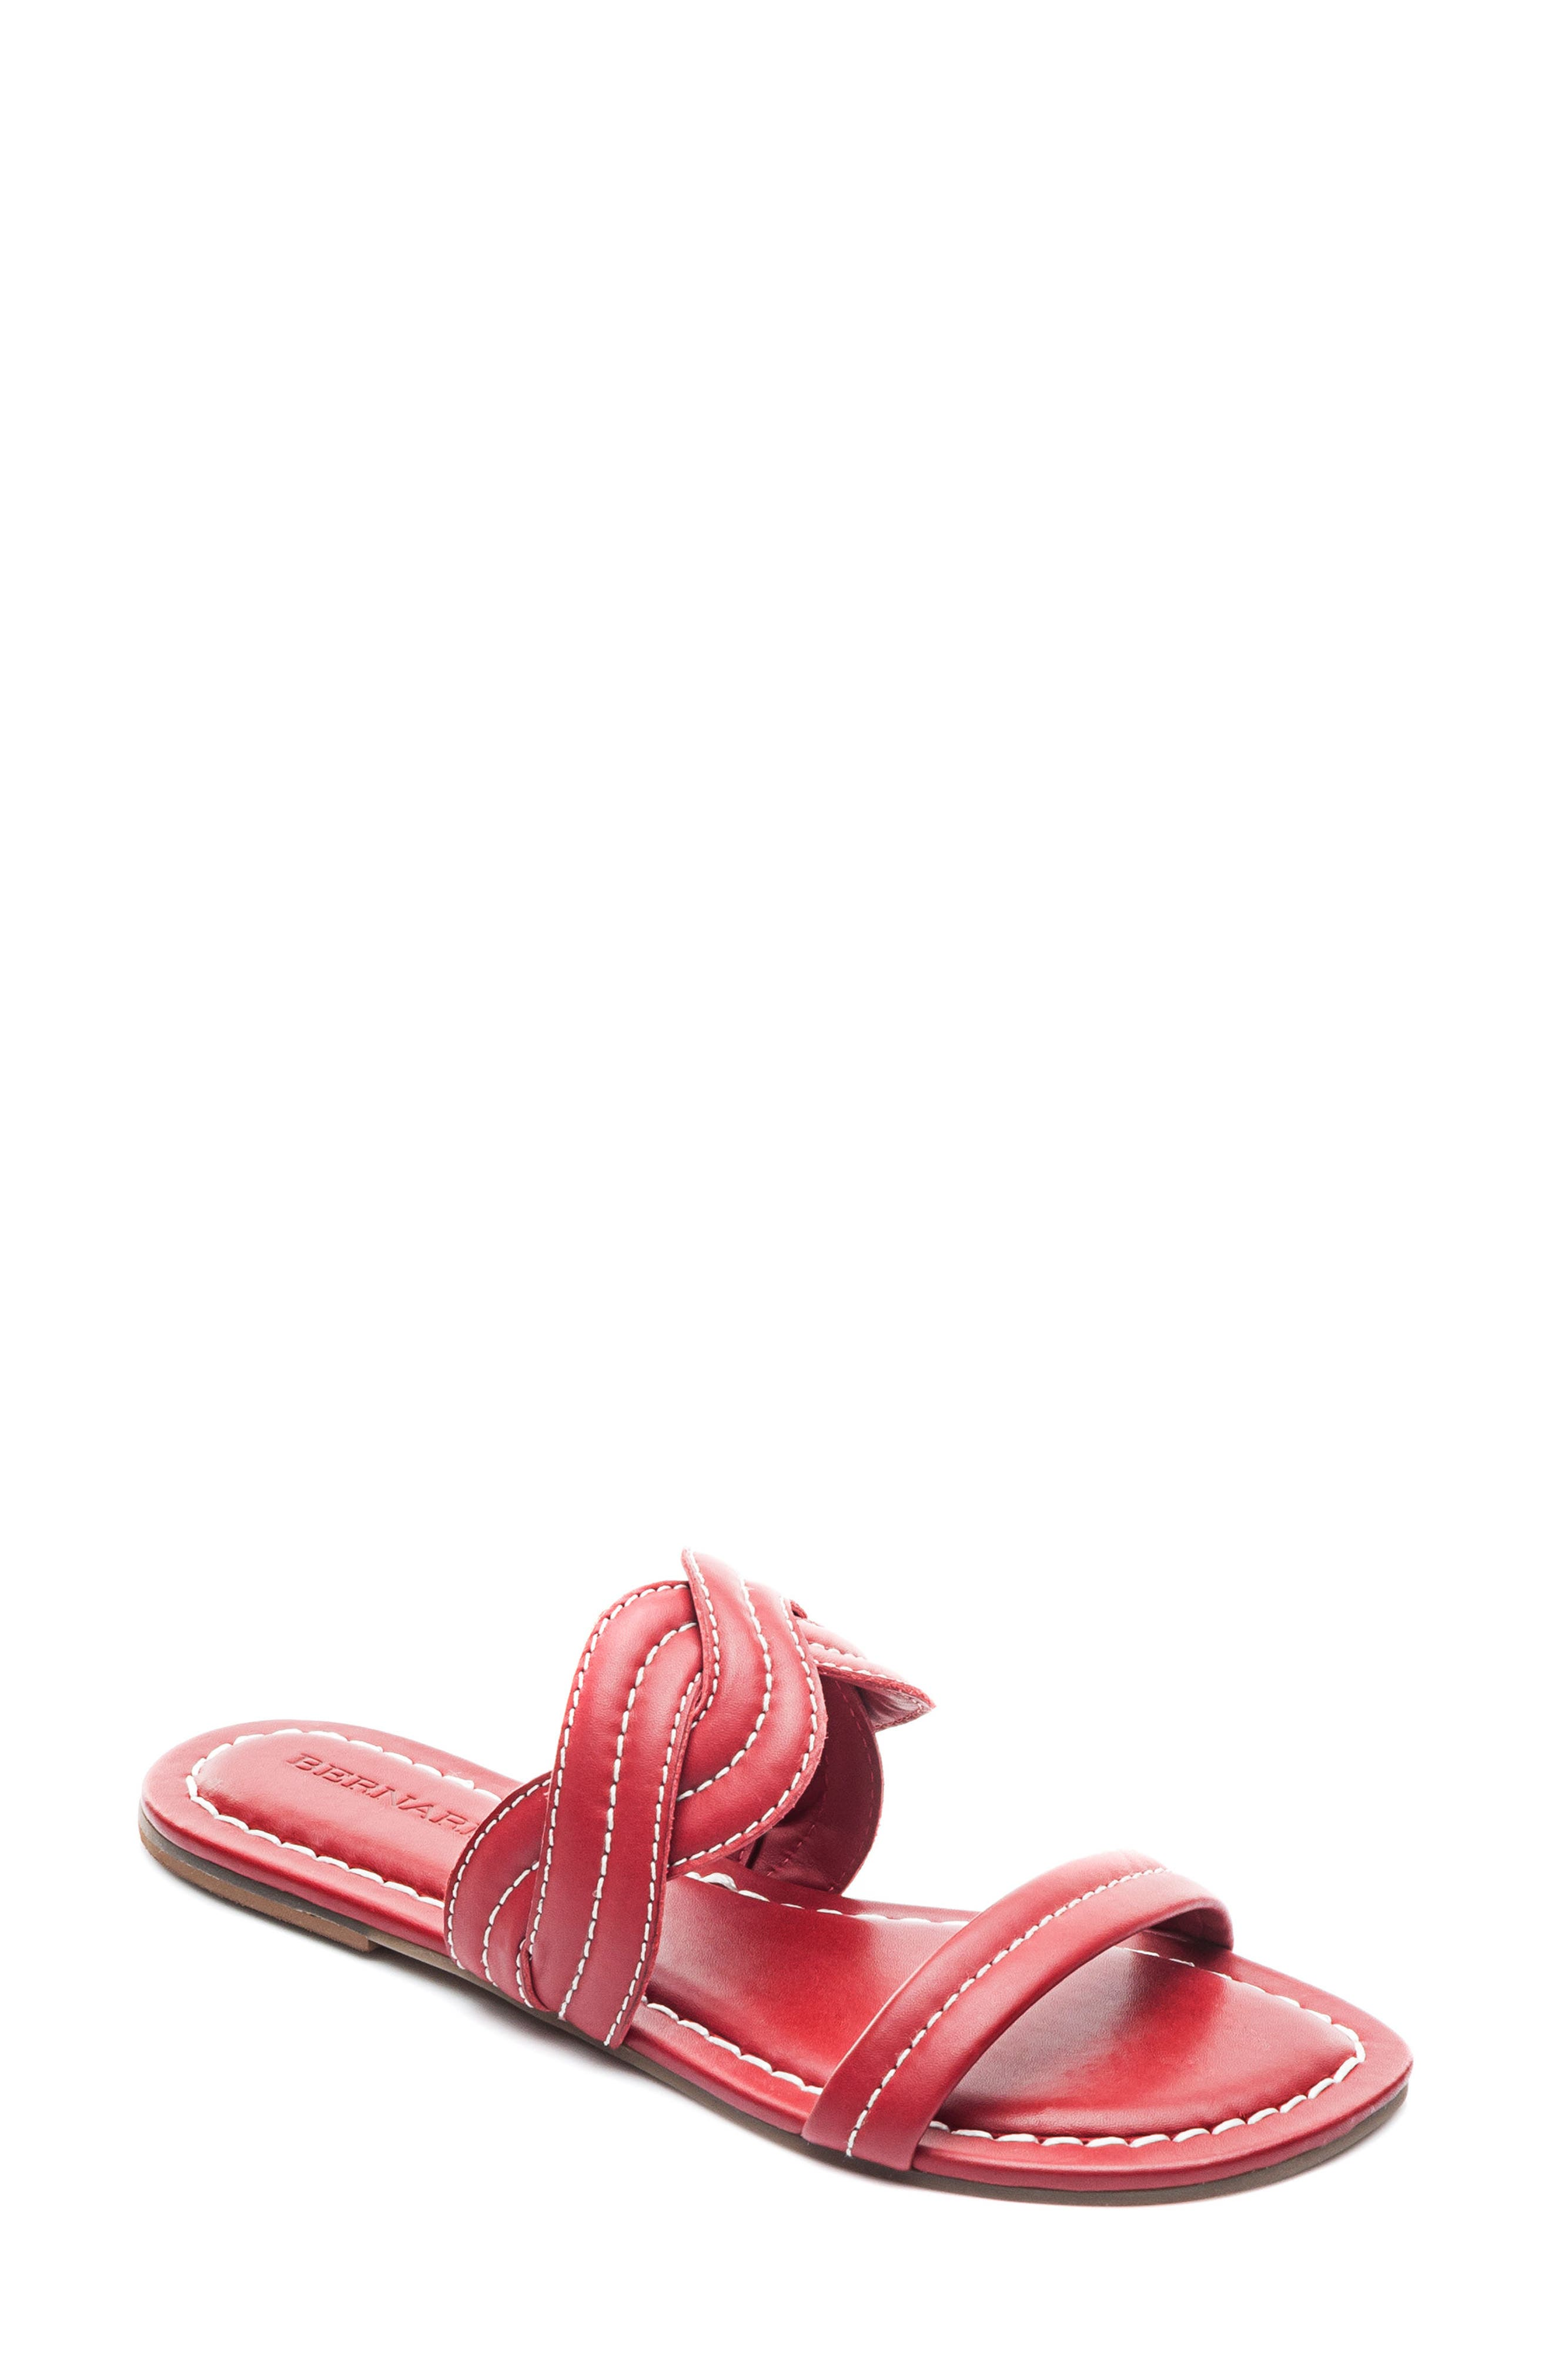 Bernardo Mirian Slide Sandal,                             Main thumbnail 3, color,